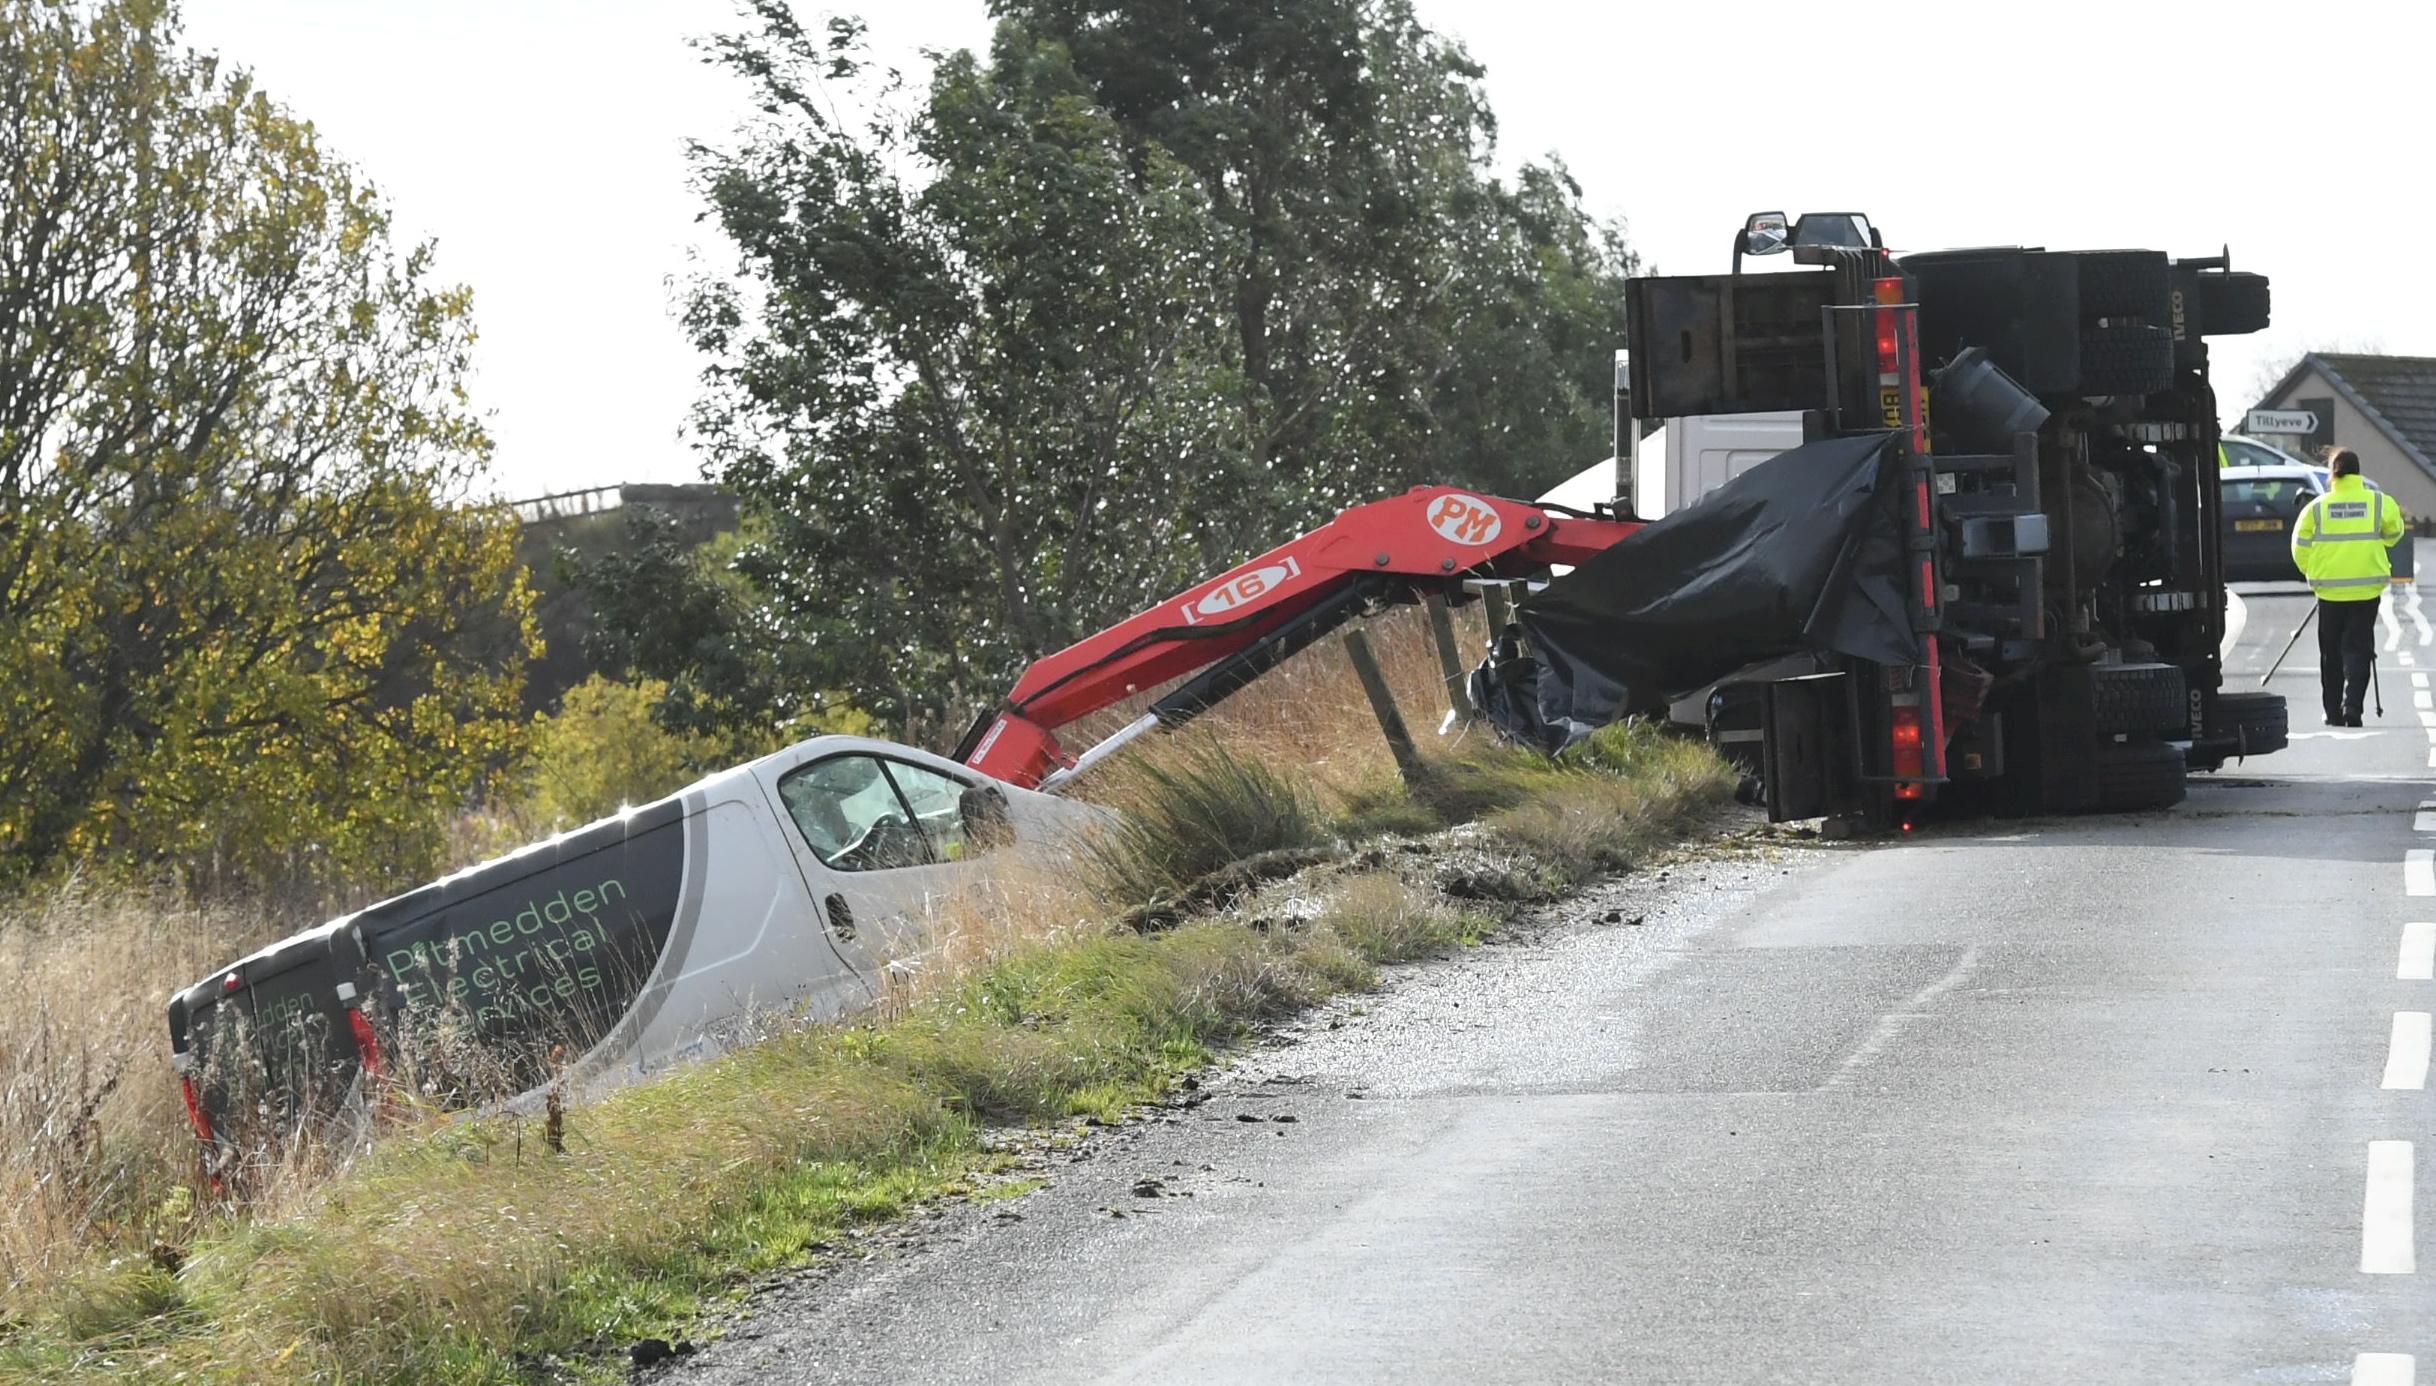 The scene of the tragic accident.